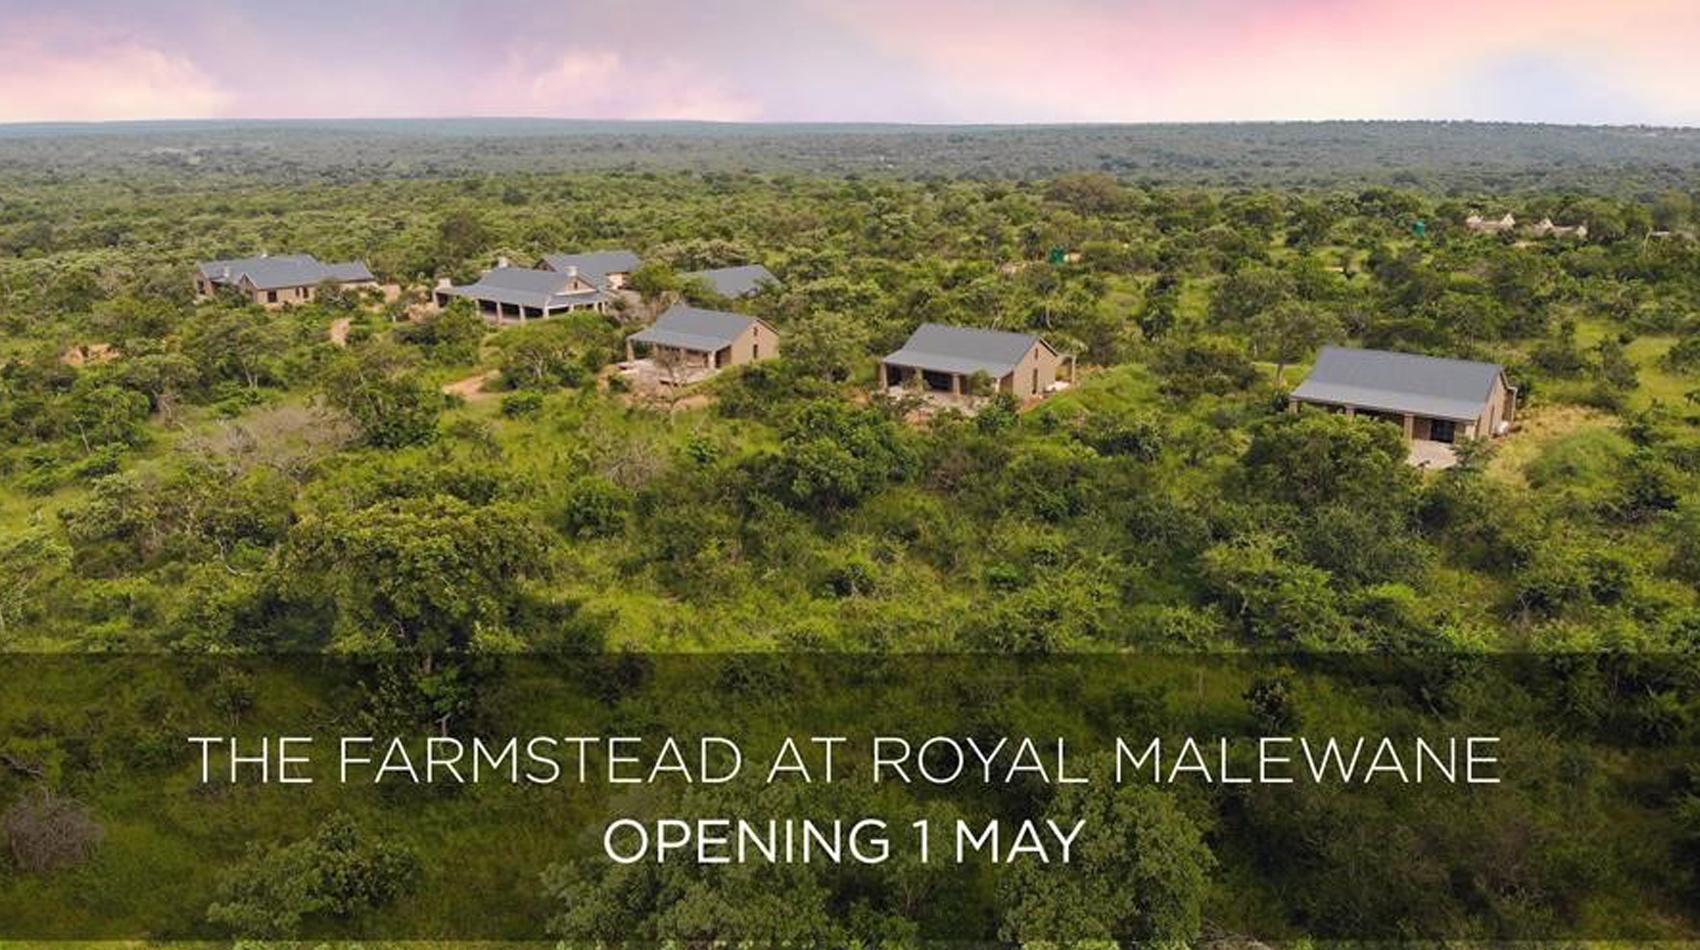 The_Farmstead_Royal_Malewane